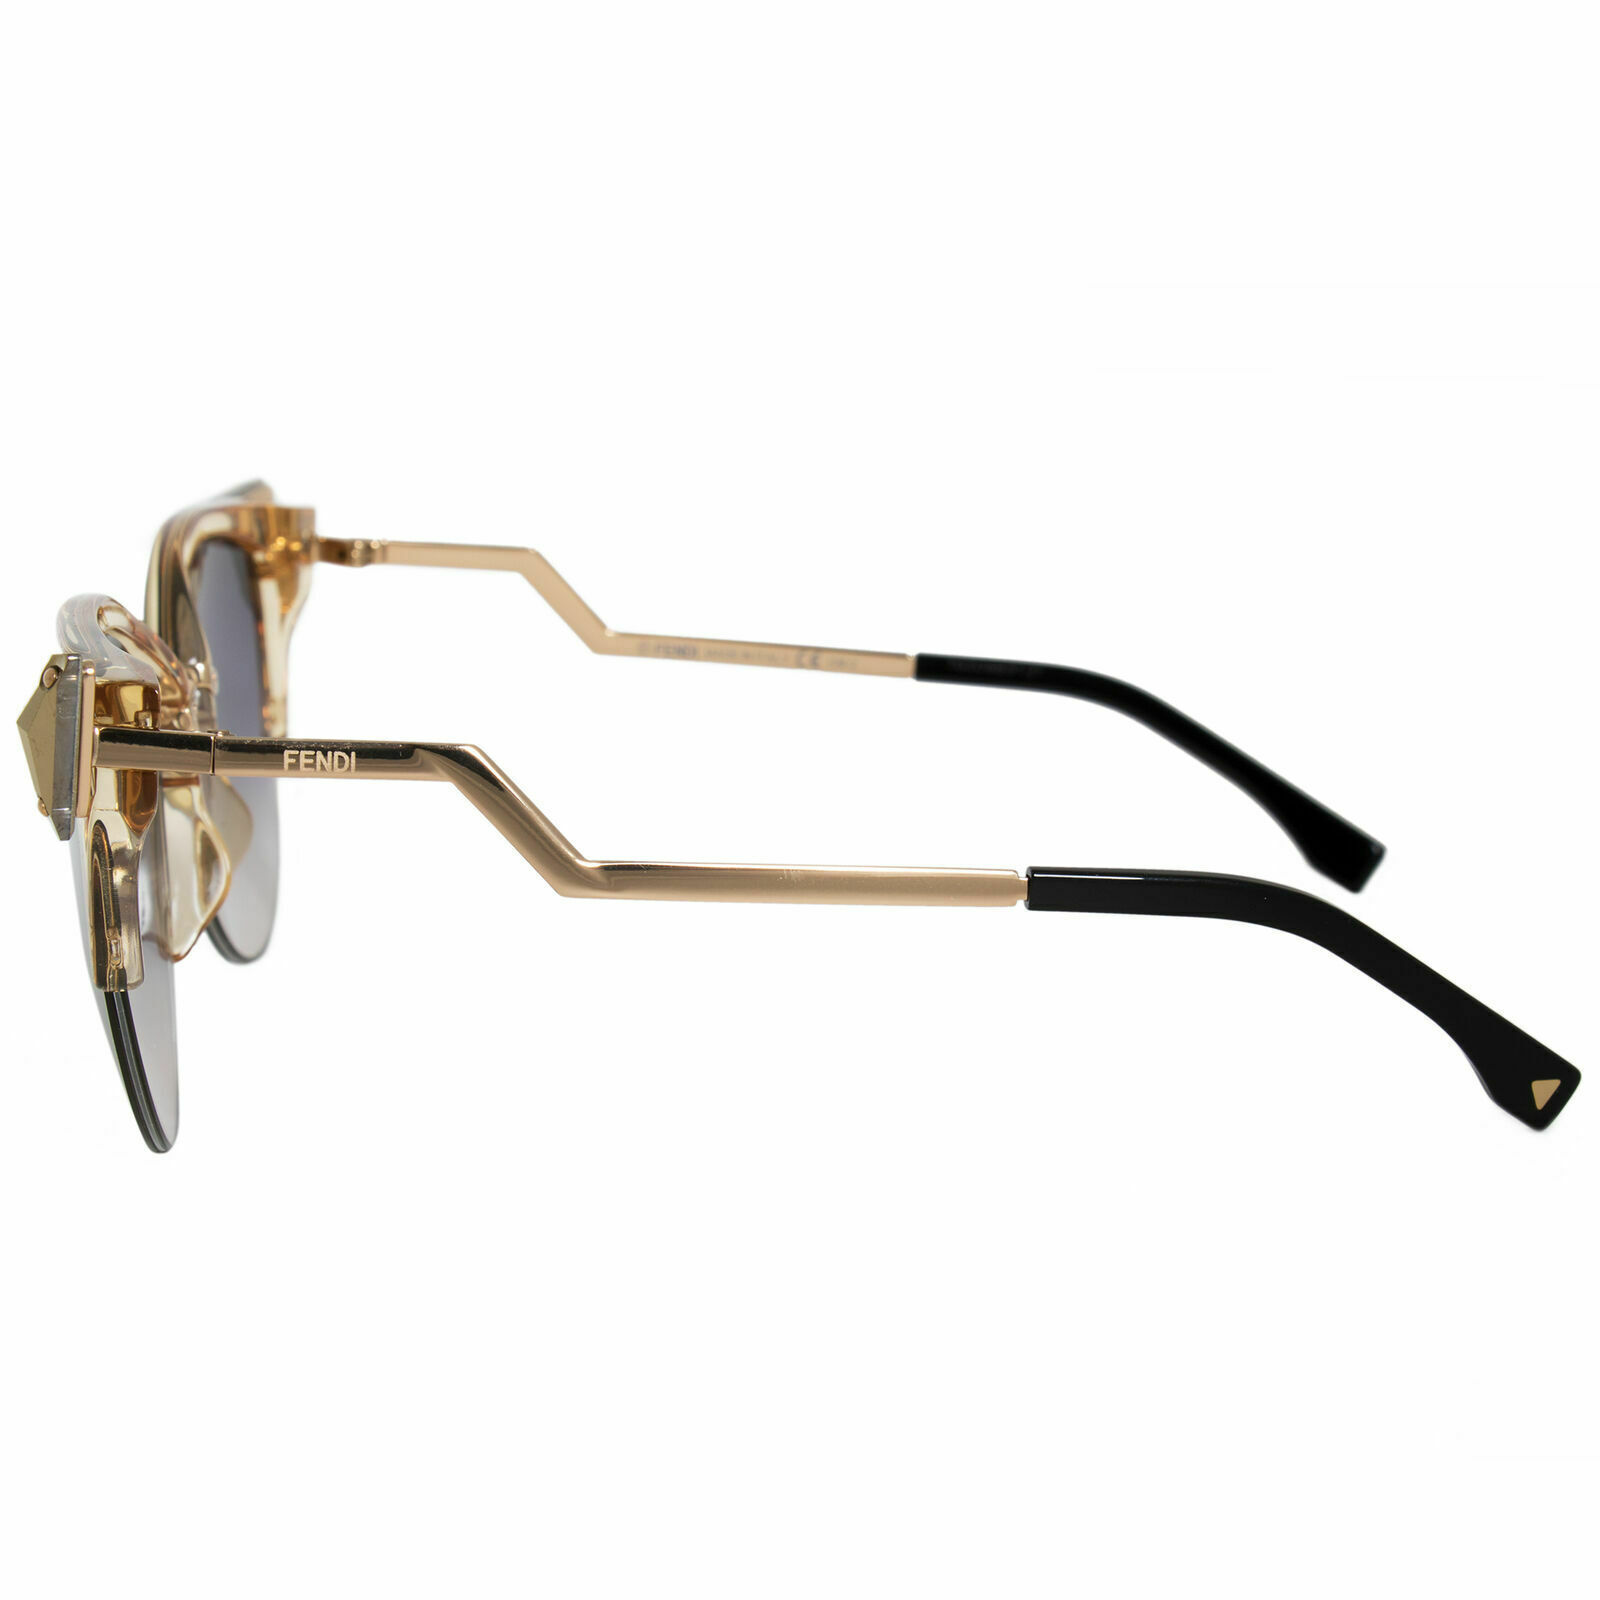 NEW FENDI IRIDIA FF 0041/S Gold/Grey-Brown Mirrored 27L/FQ Cat Eye Sunglasses